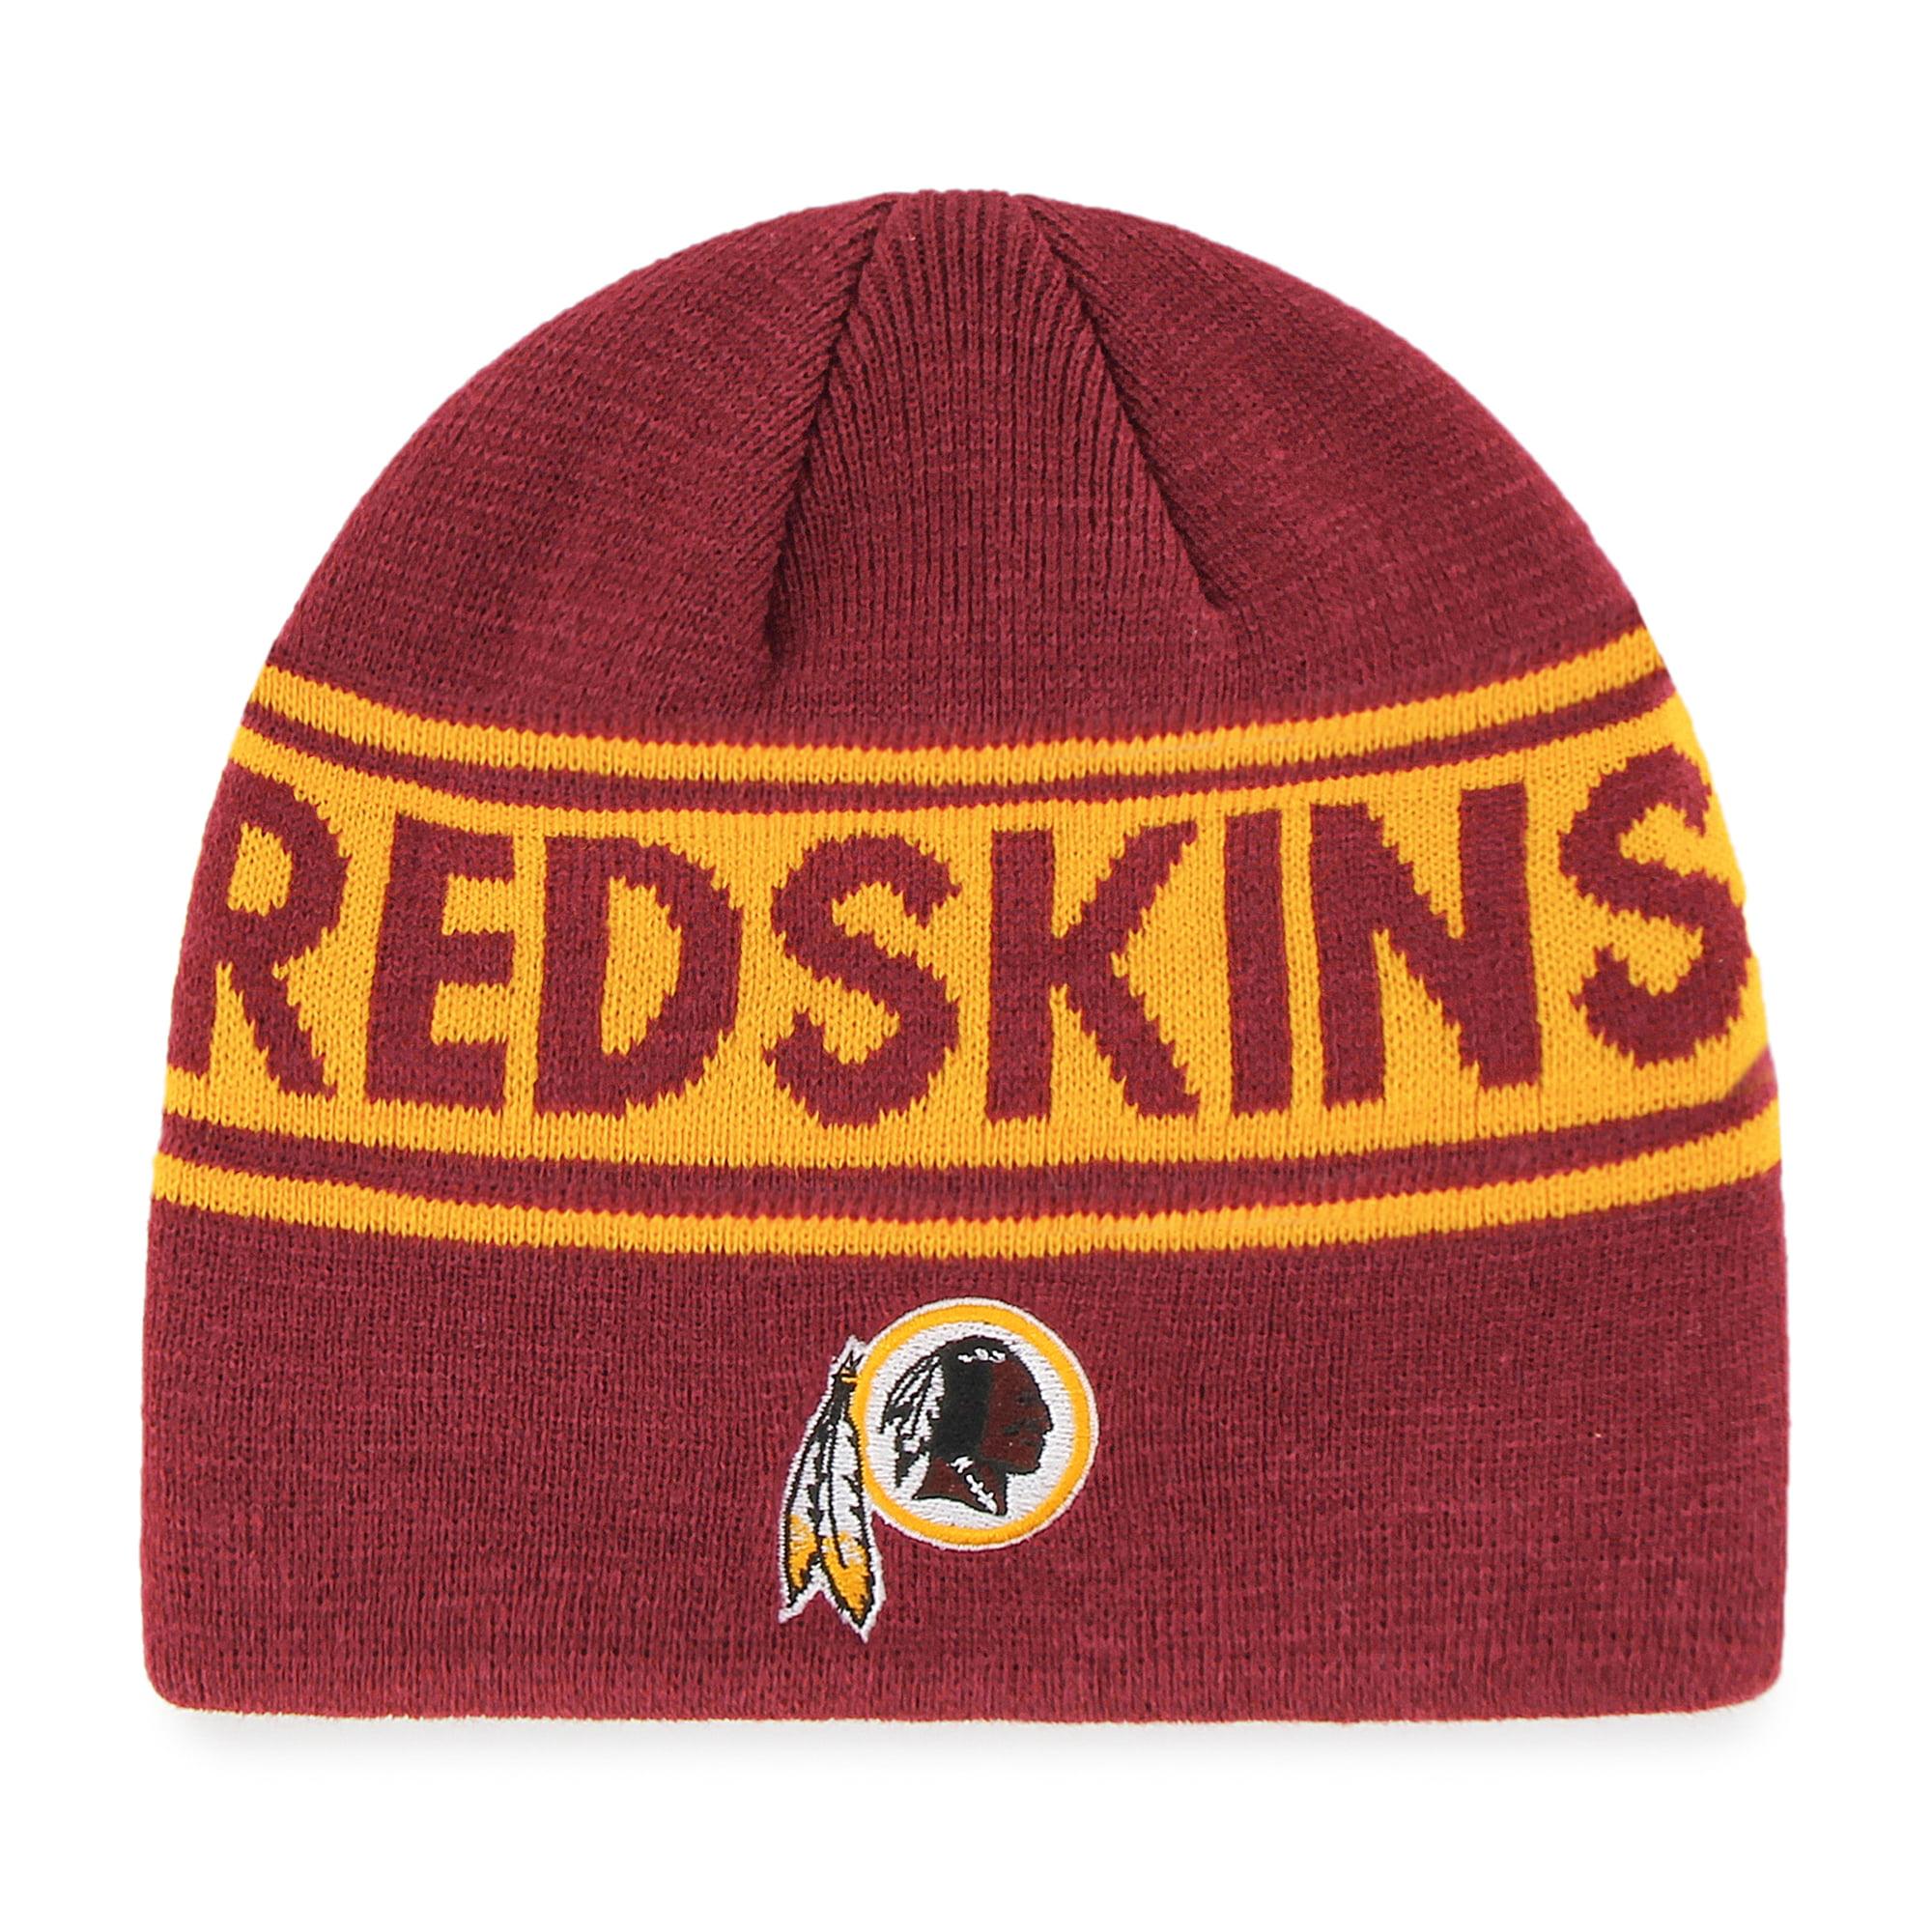 NFL Washington Redskins Bonneville Knit Beanie by Fan Favorite